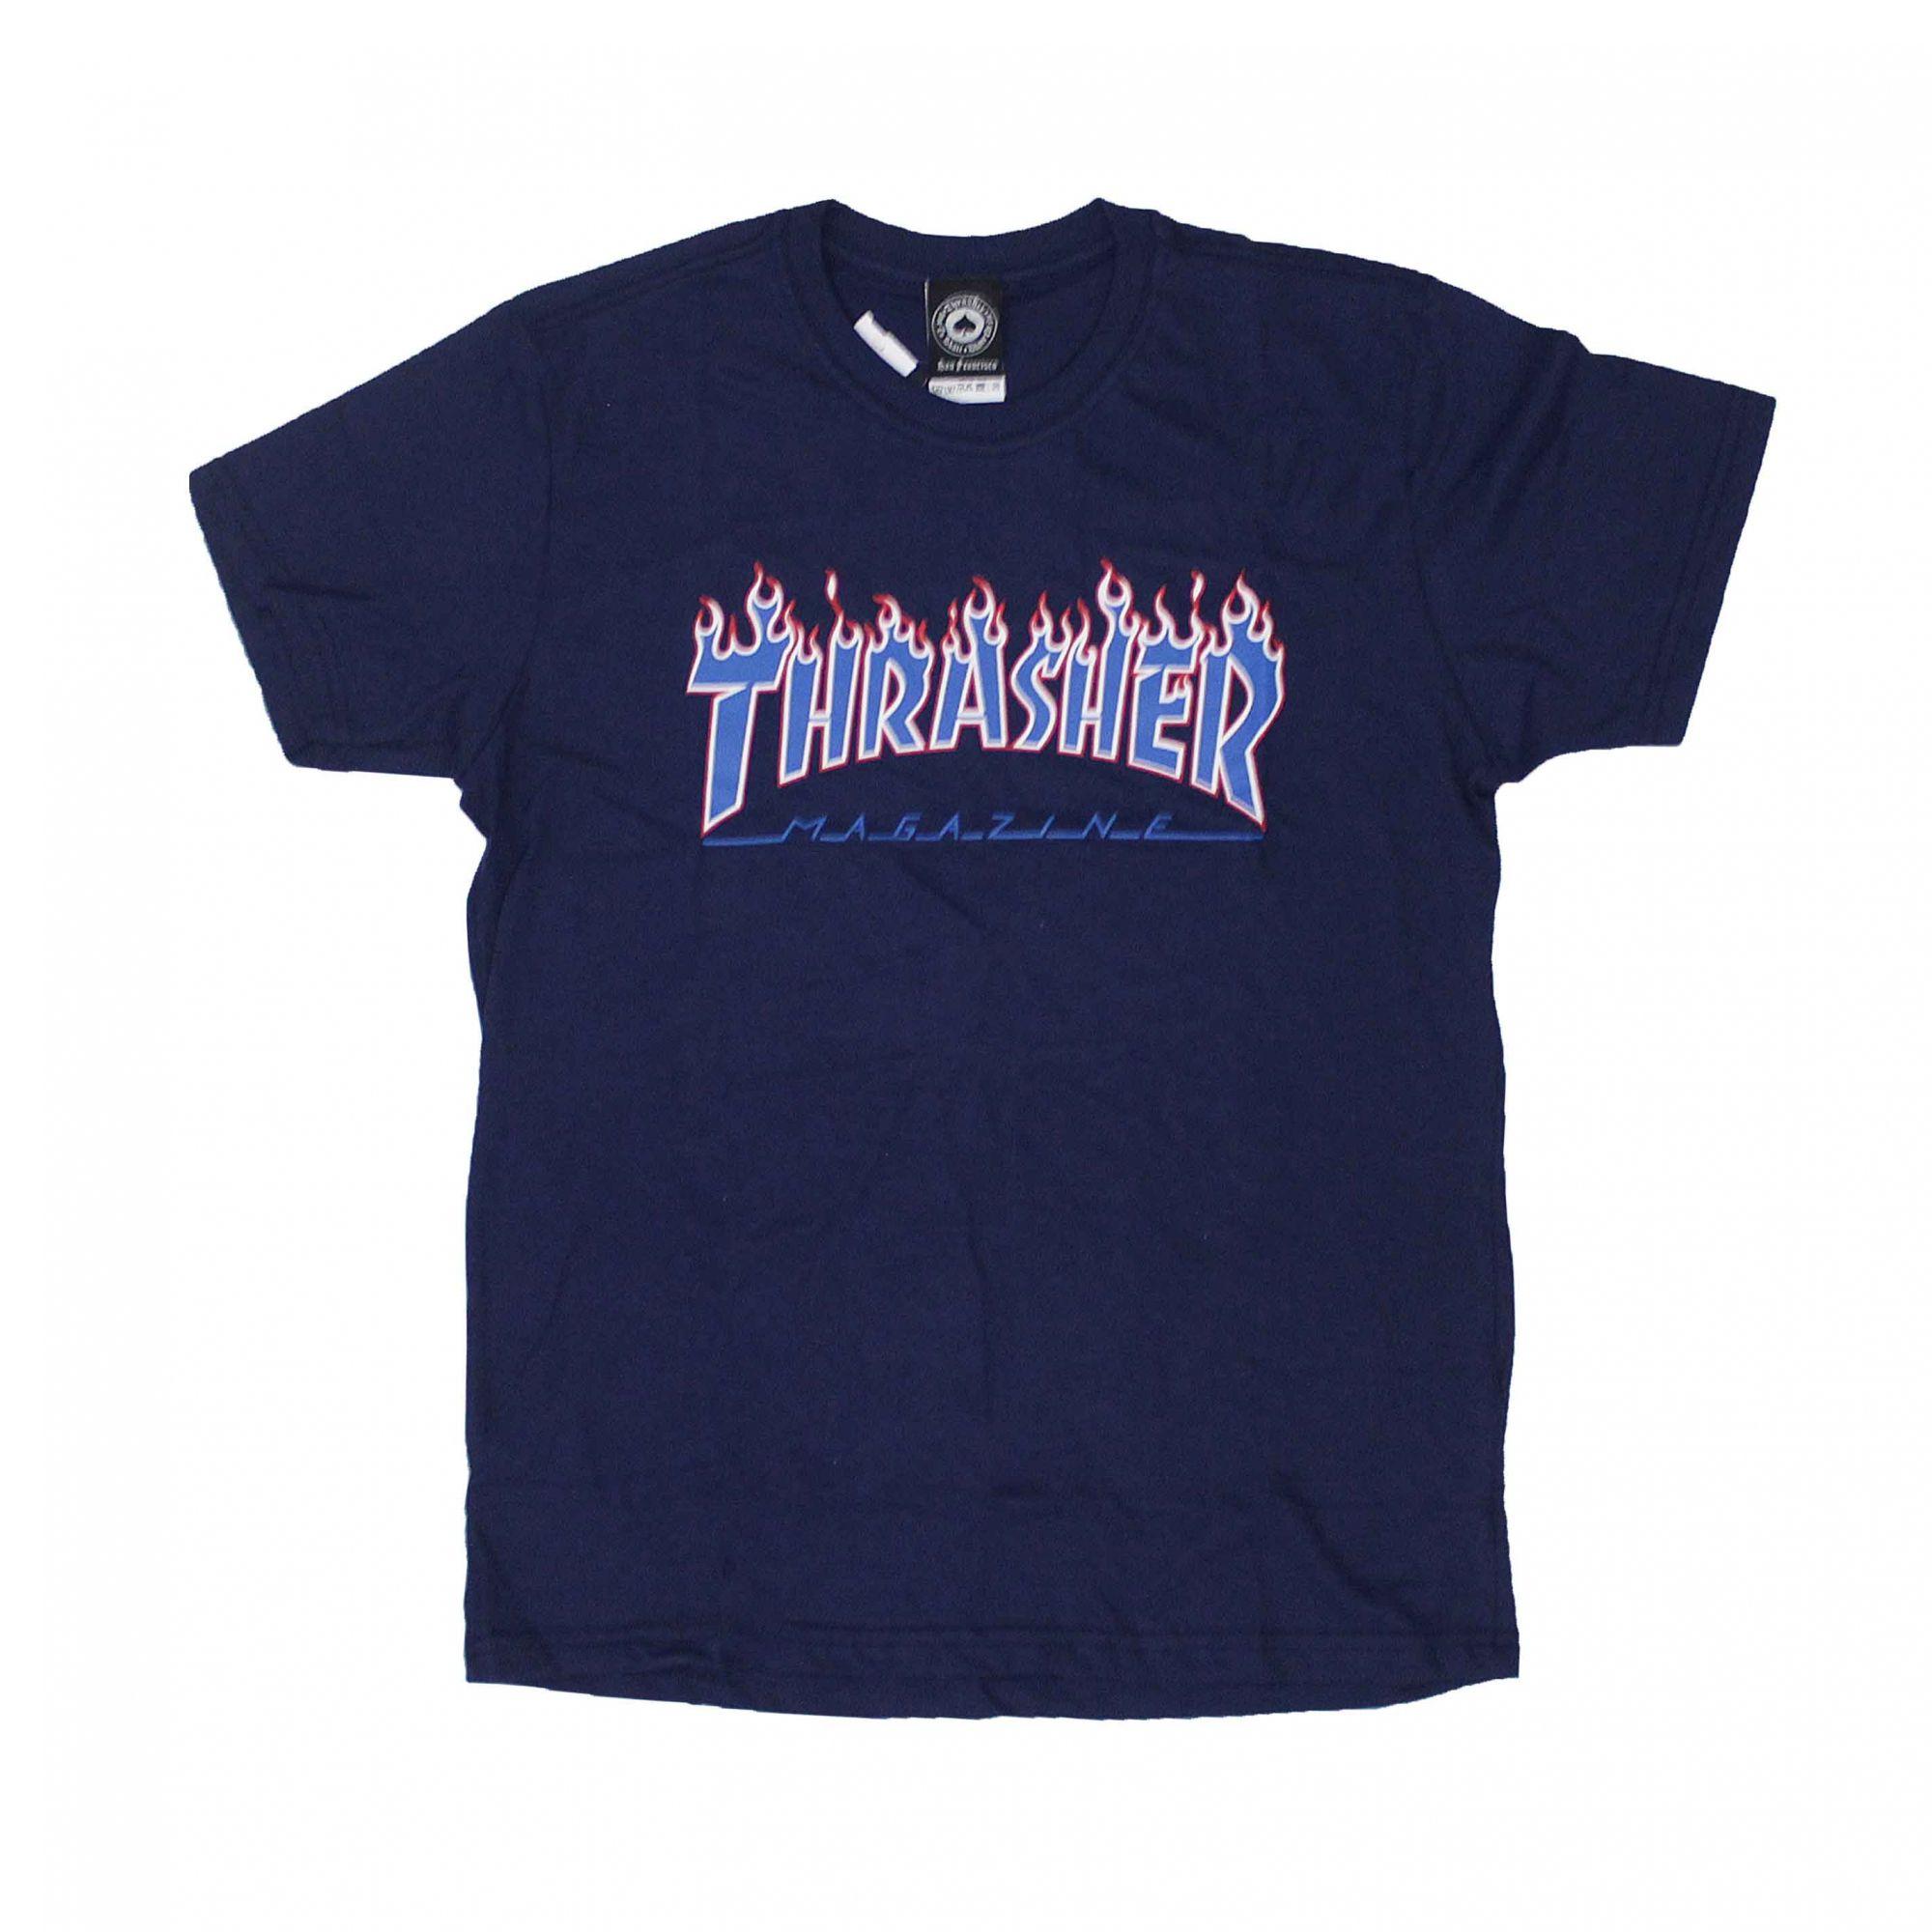 Camiseta Thrasher Magazine Patriot Flame Azul Marinho